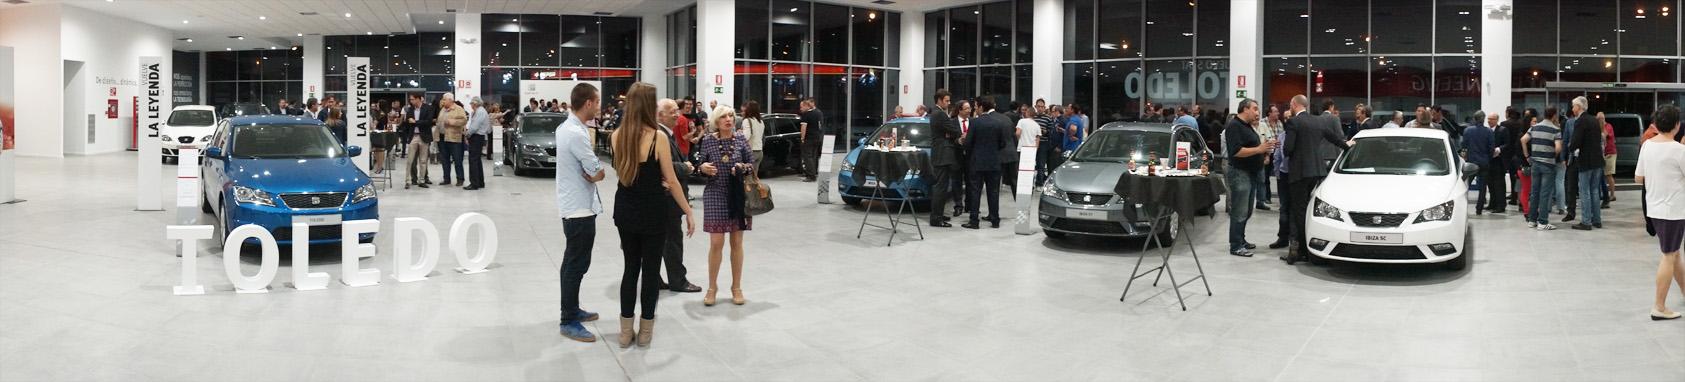 SEAT Aragon Car Inauguración6